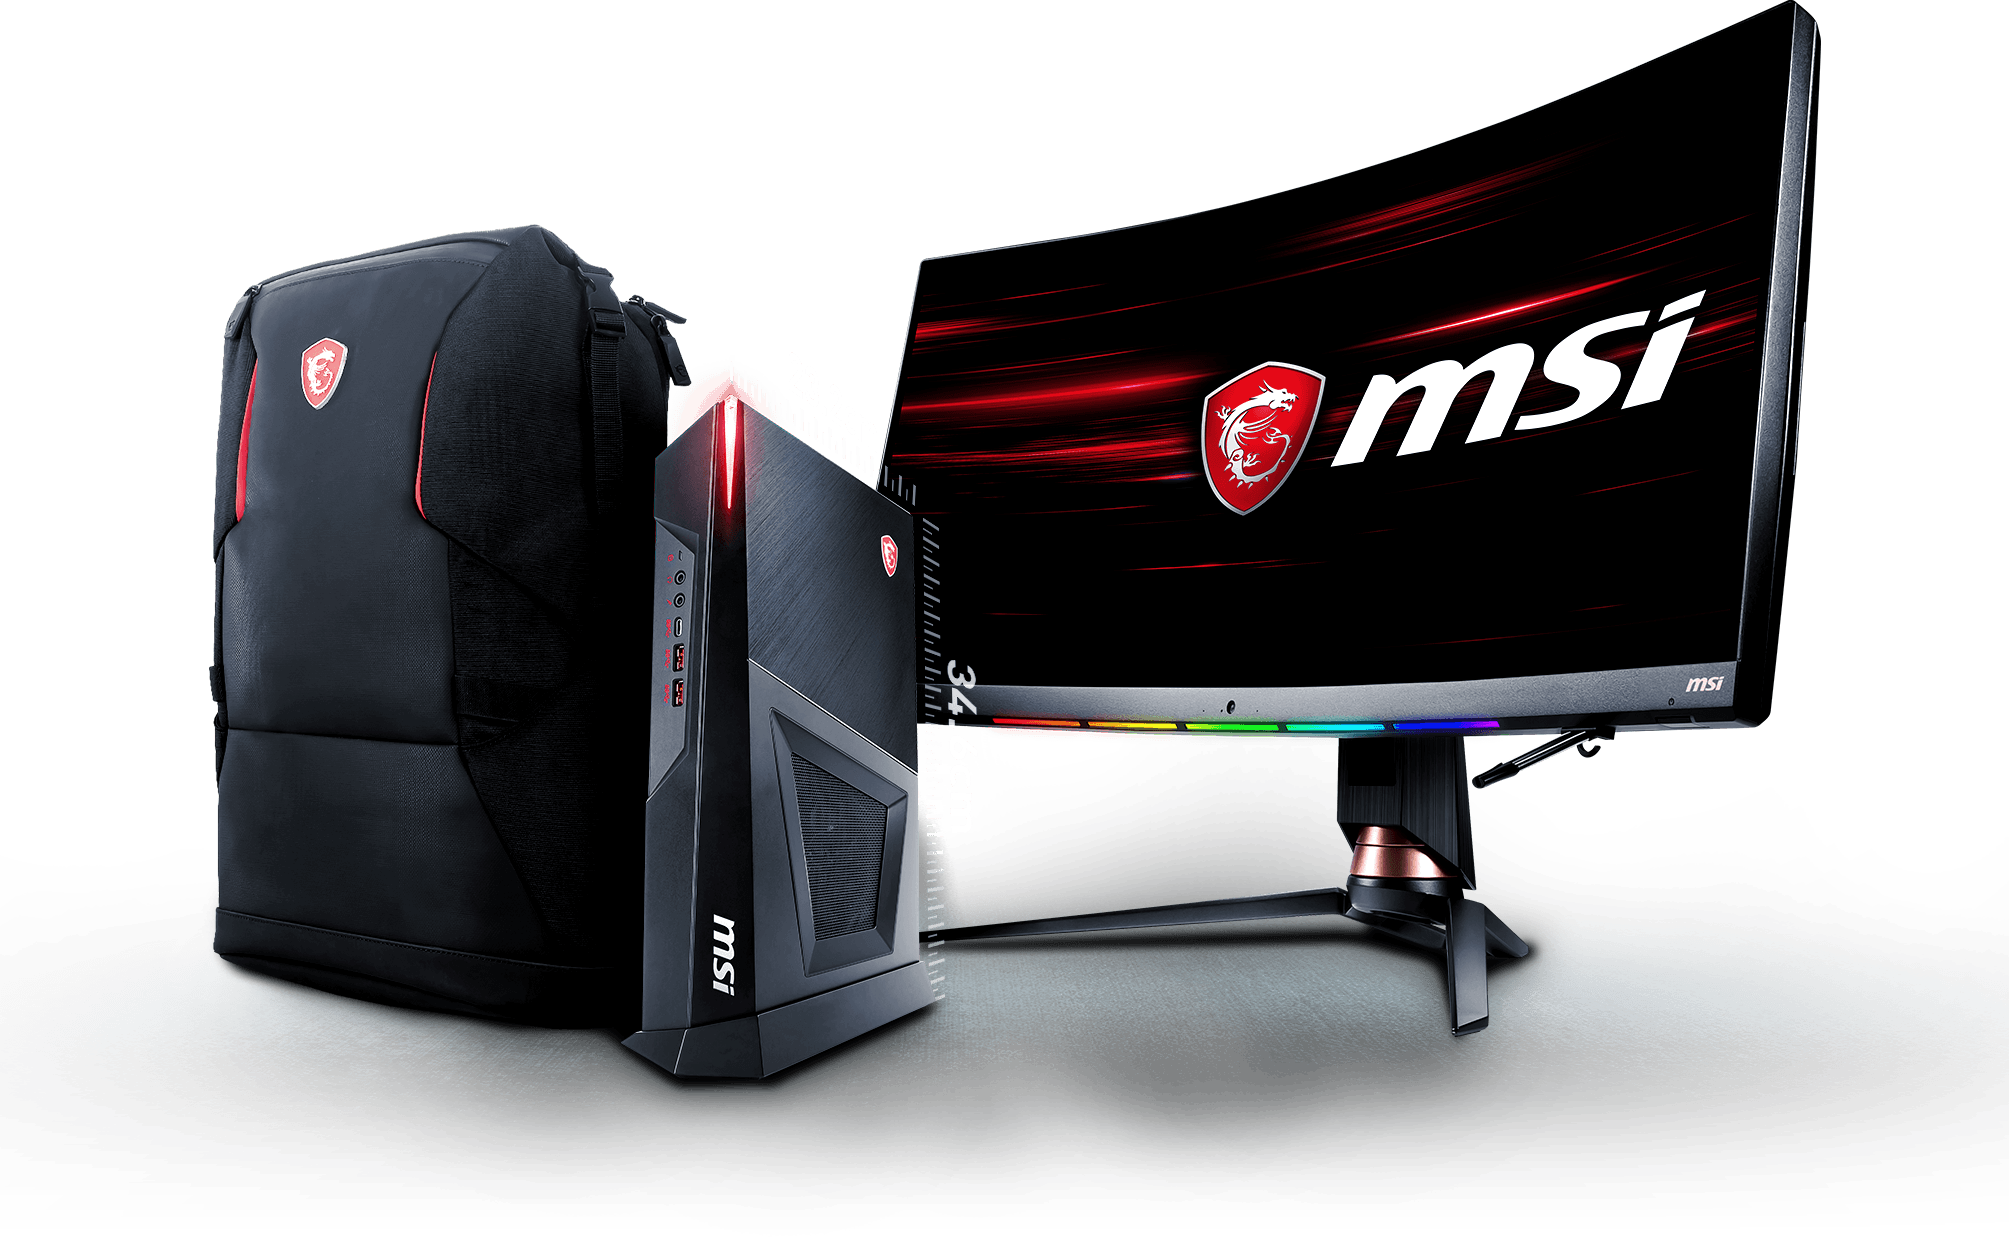 Best MSI Gaming Desktop